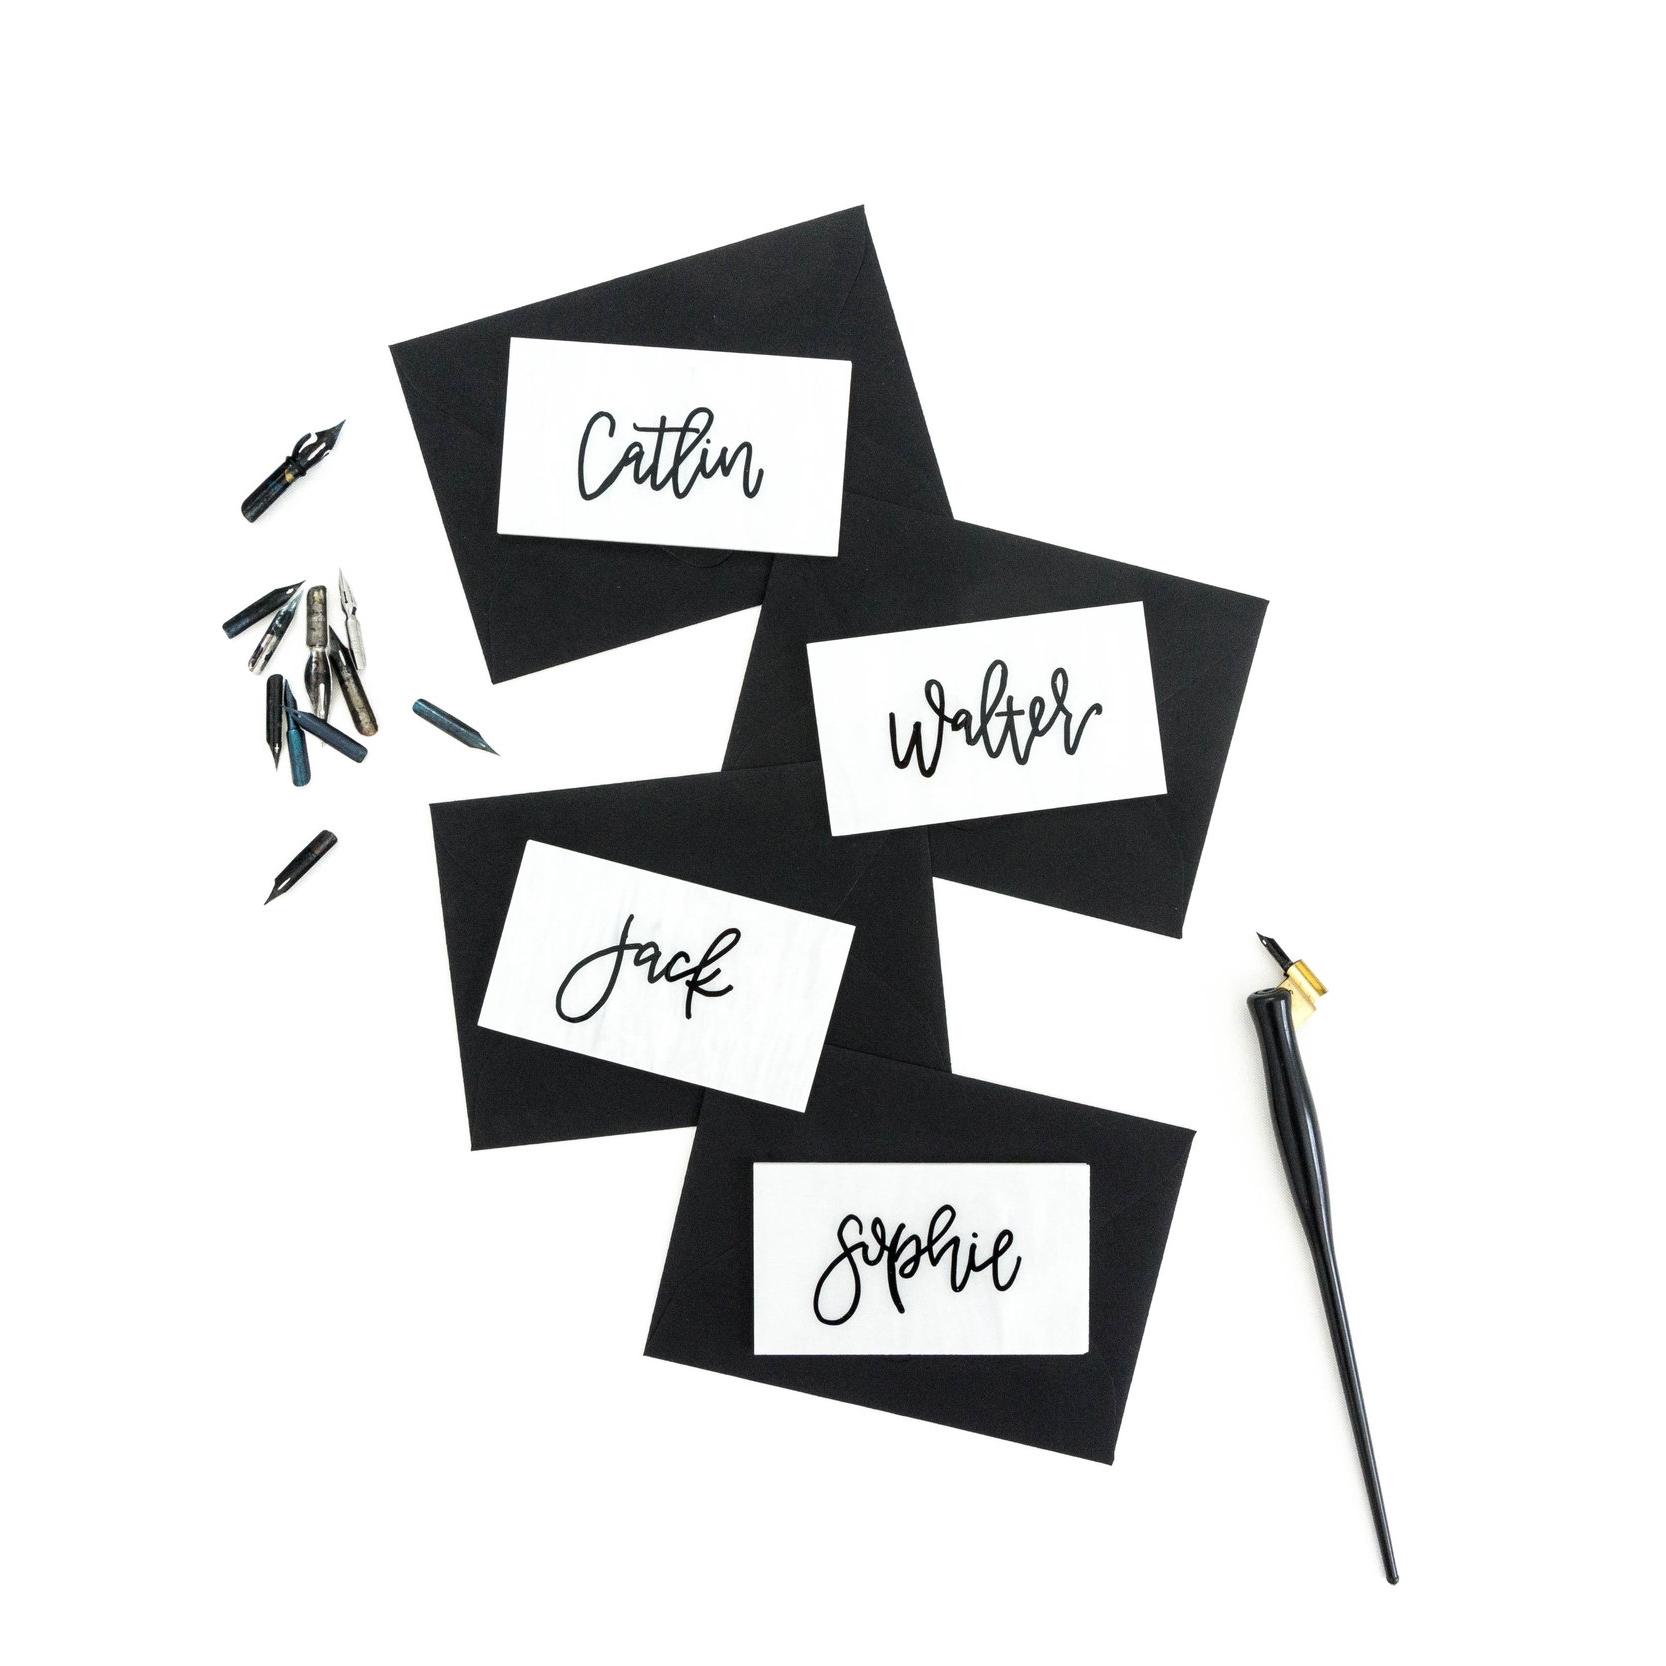 love-fern-design-studio-custom-wedding-invitations-for-the-modern-couple-modern-calligraphy-in-seattle-washington-custom-wedding-stationery39.jpg